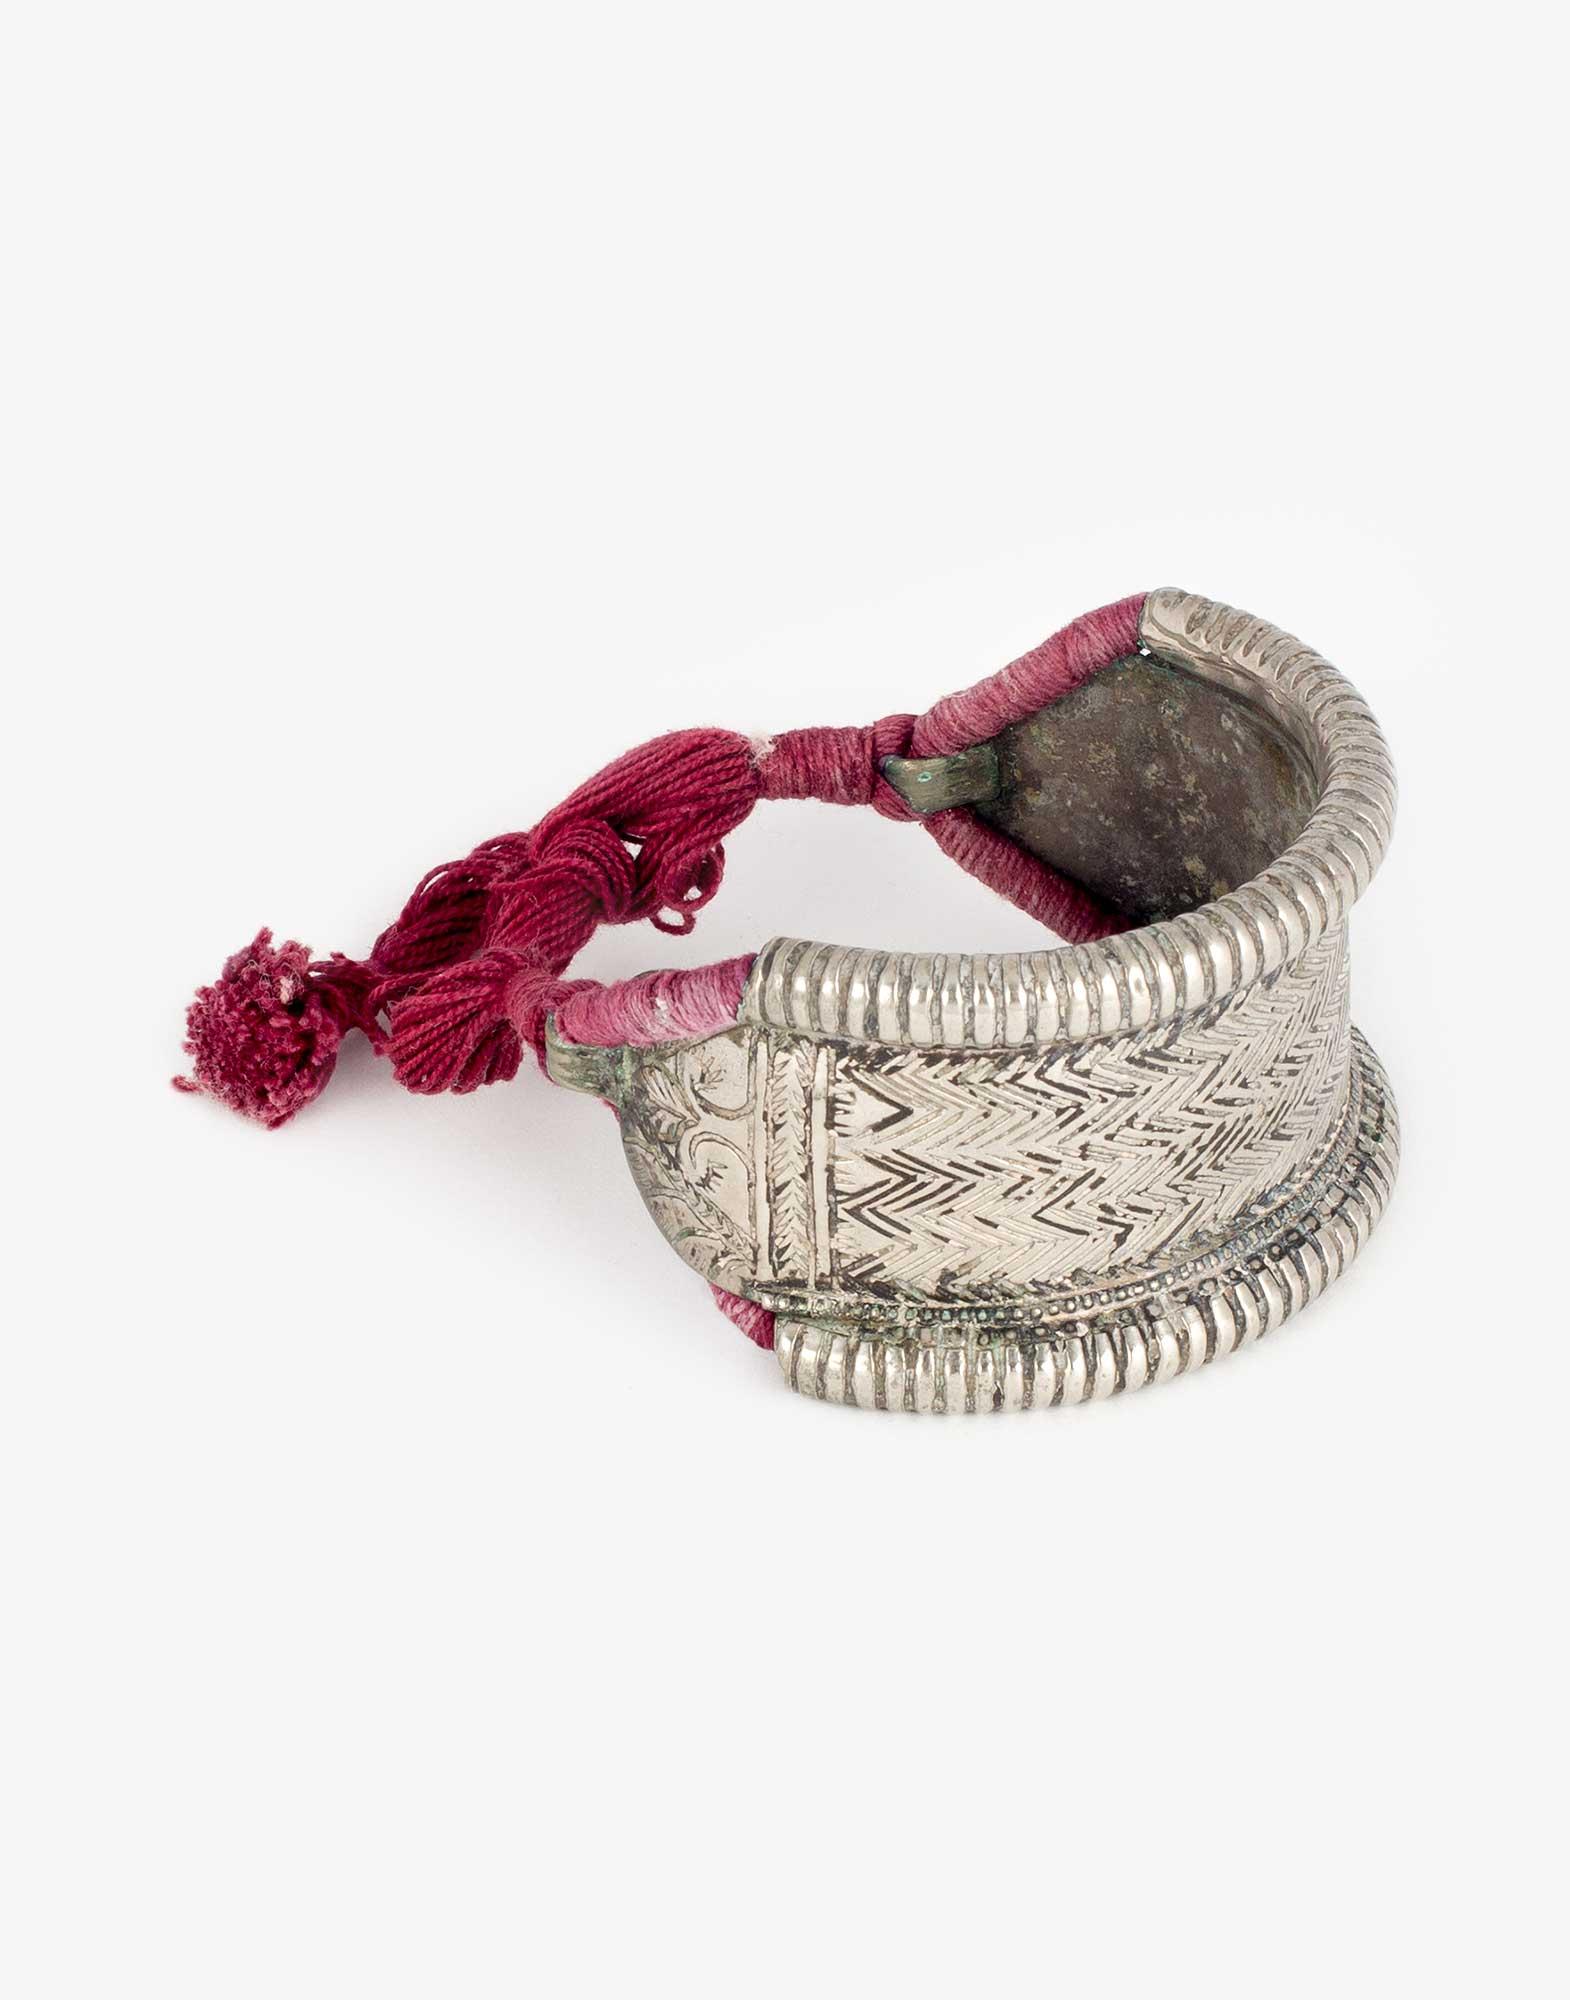 Antique Silver Nepalese Bracelet